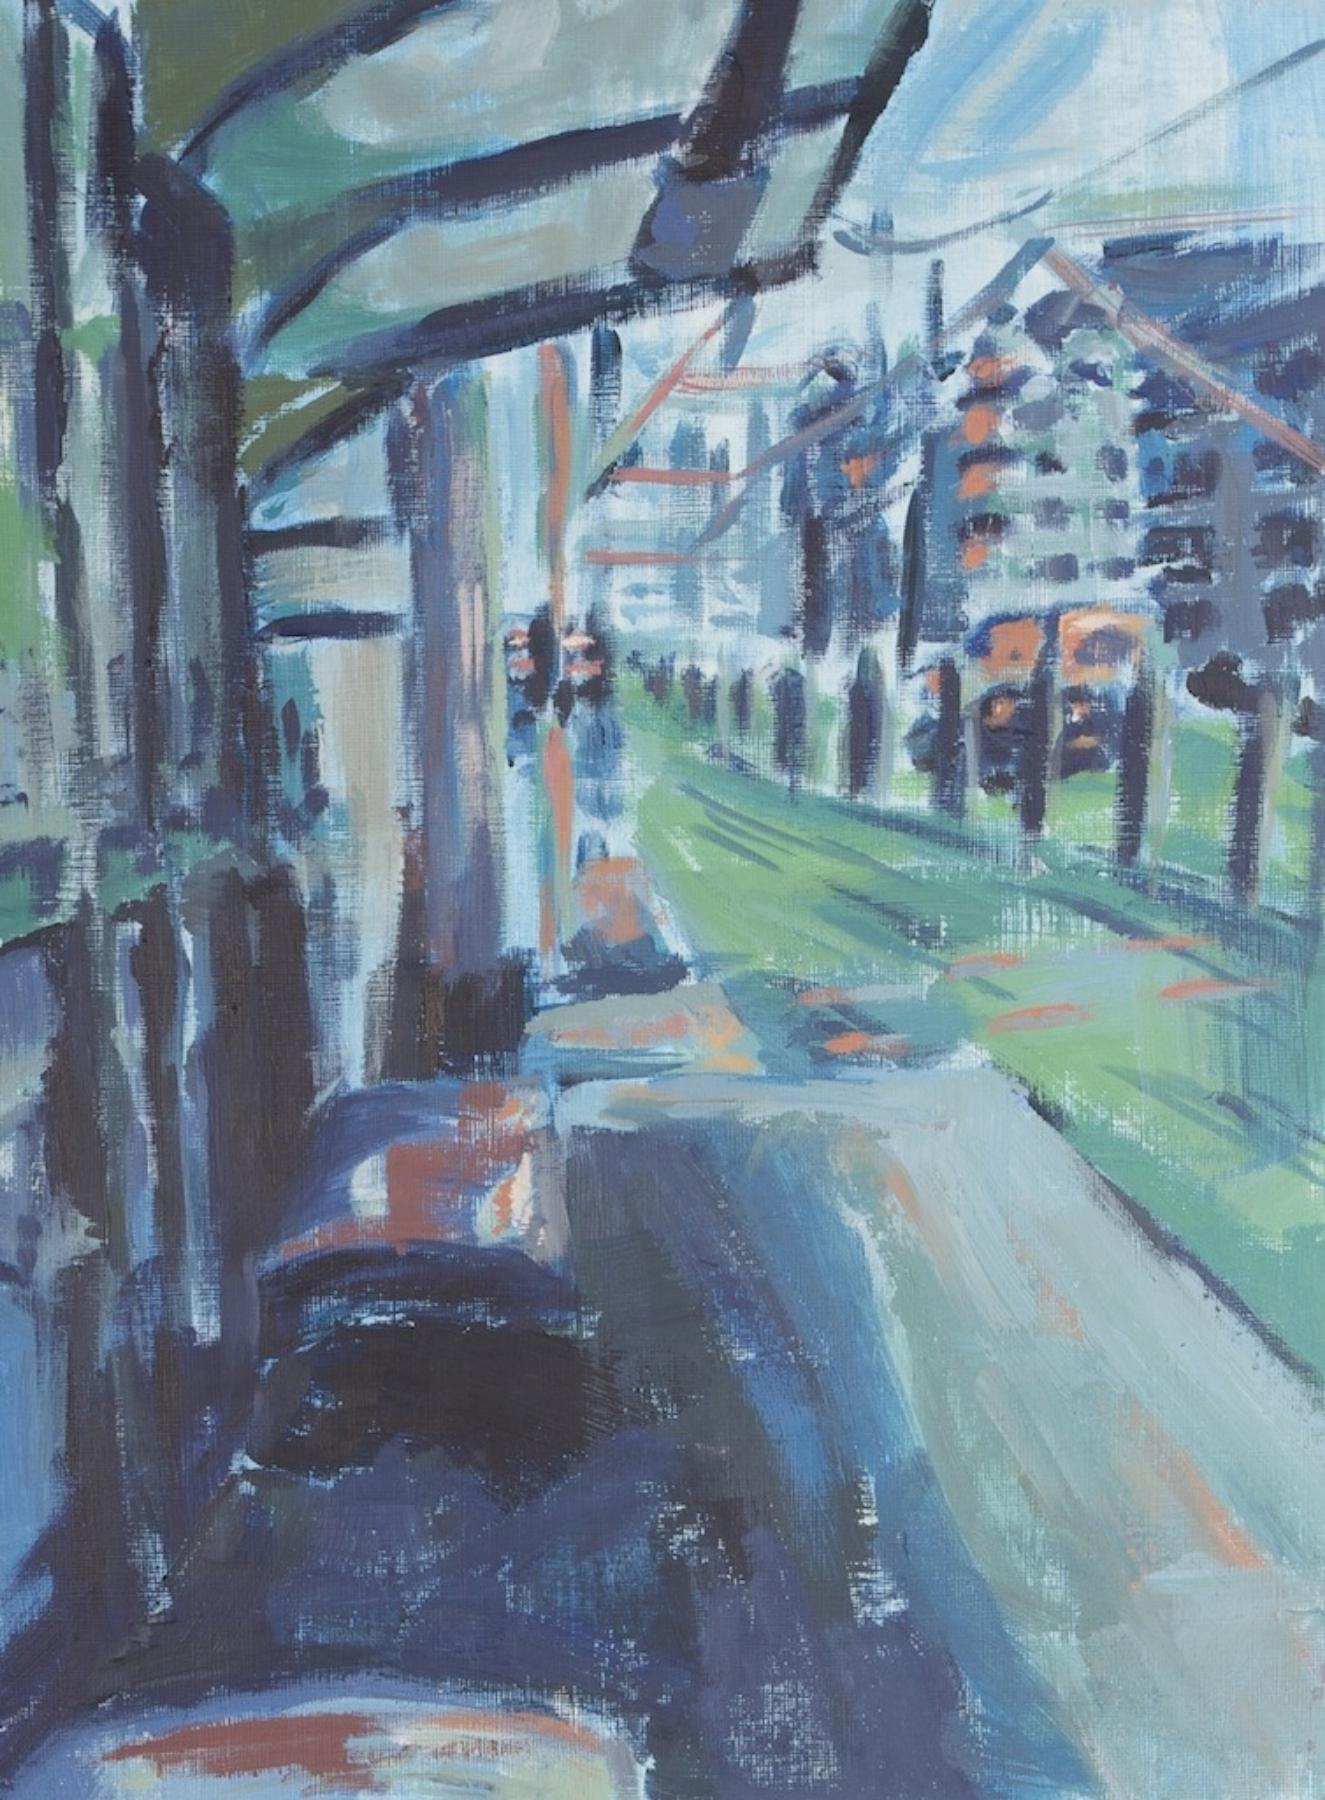 Study: Straßenbahn Haltestelle